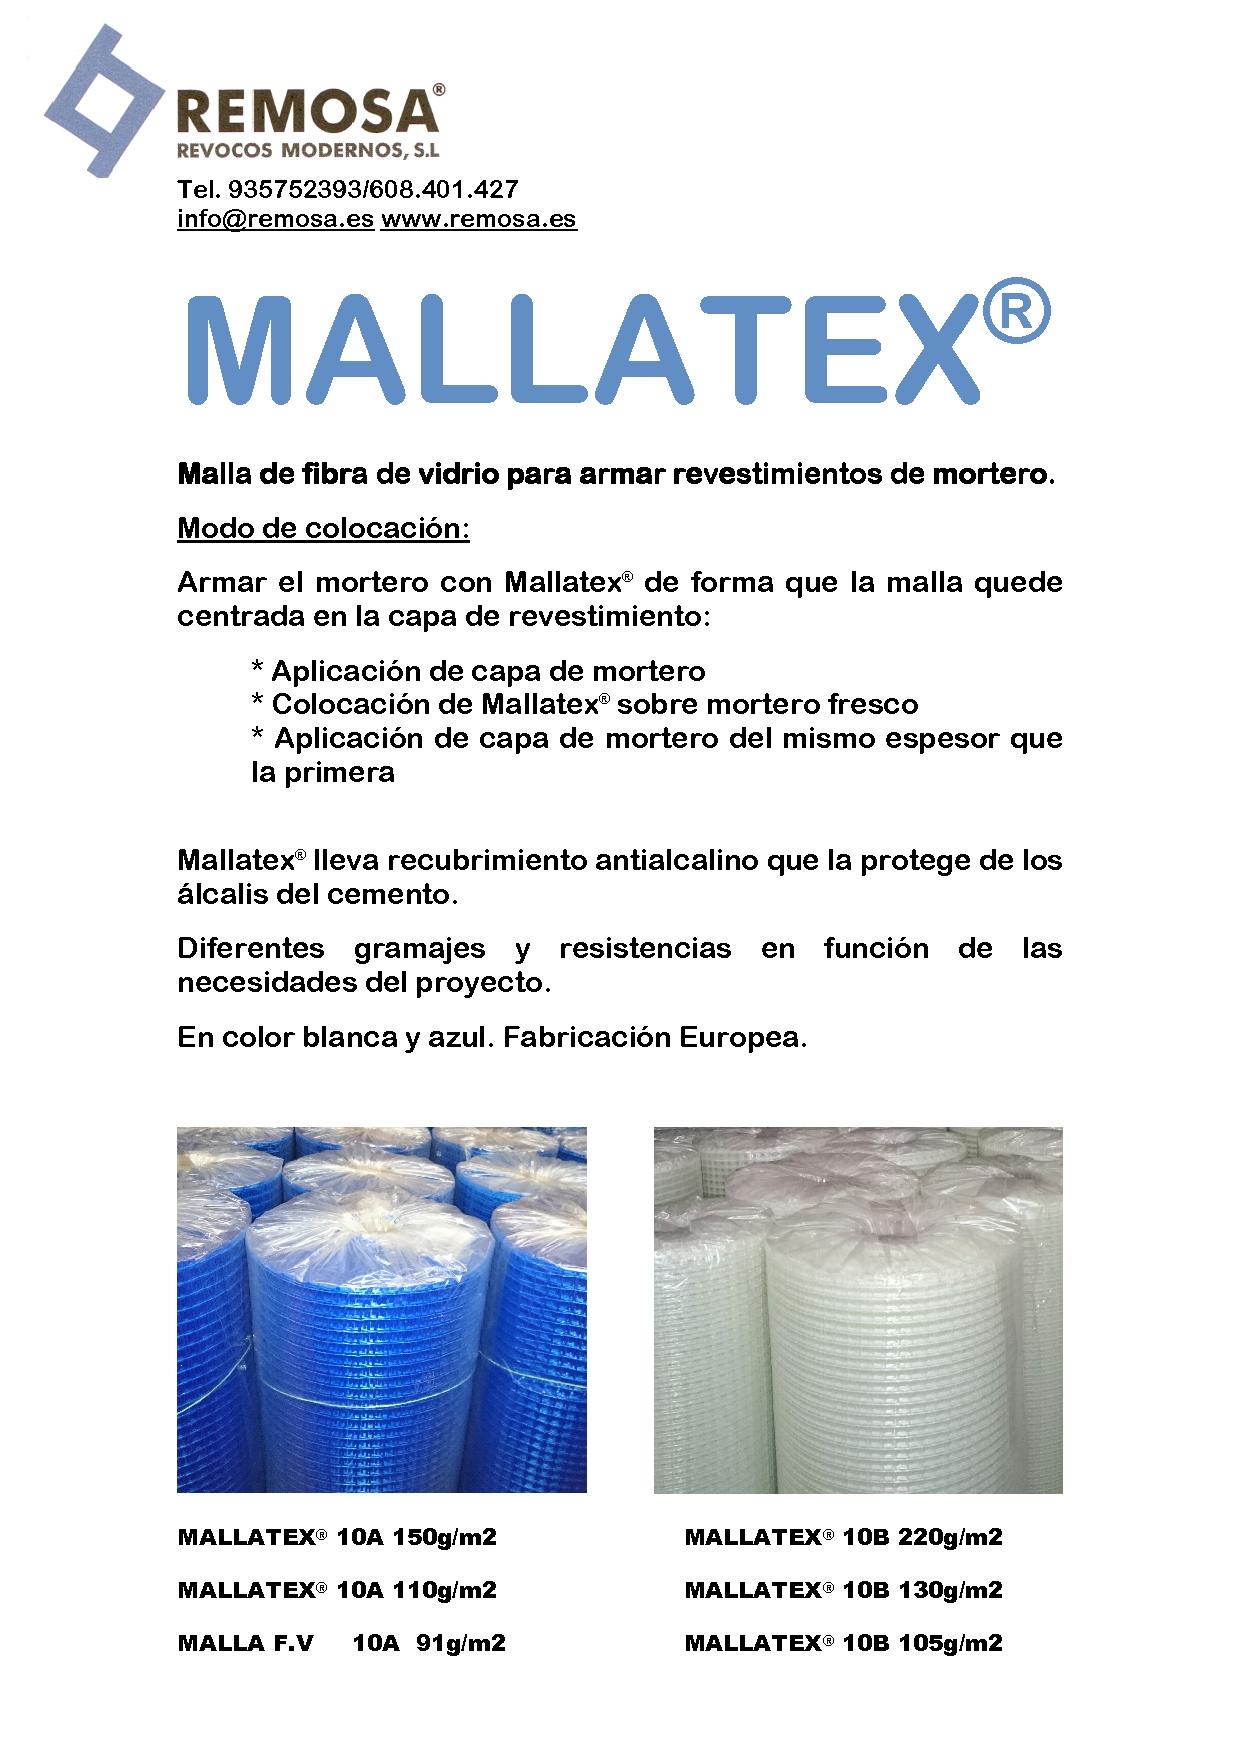 MALLATEX